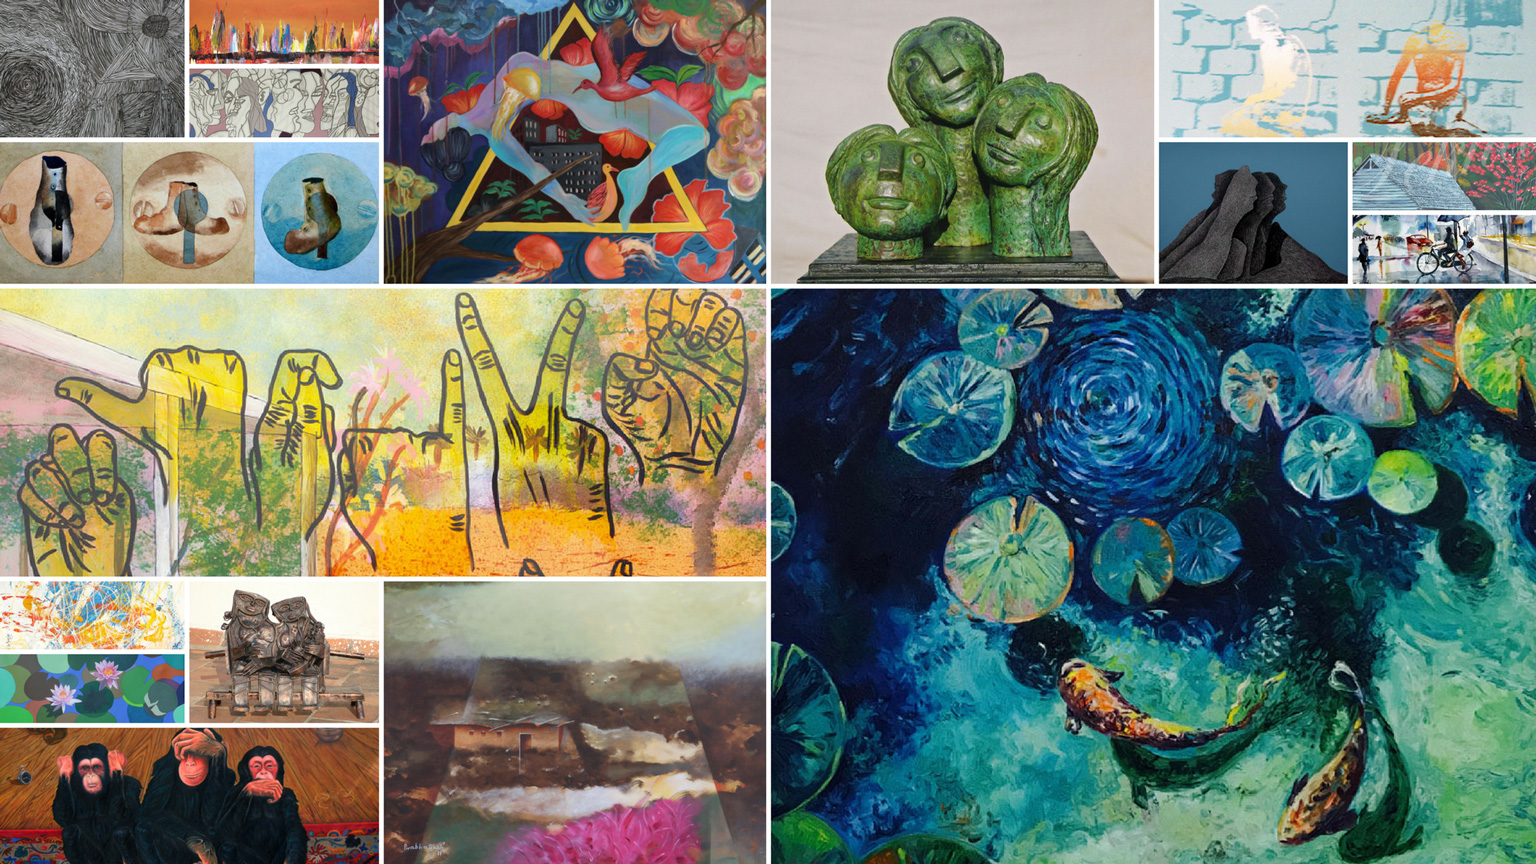 Collage of NJA artworks